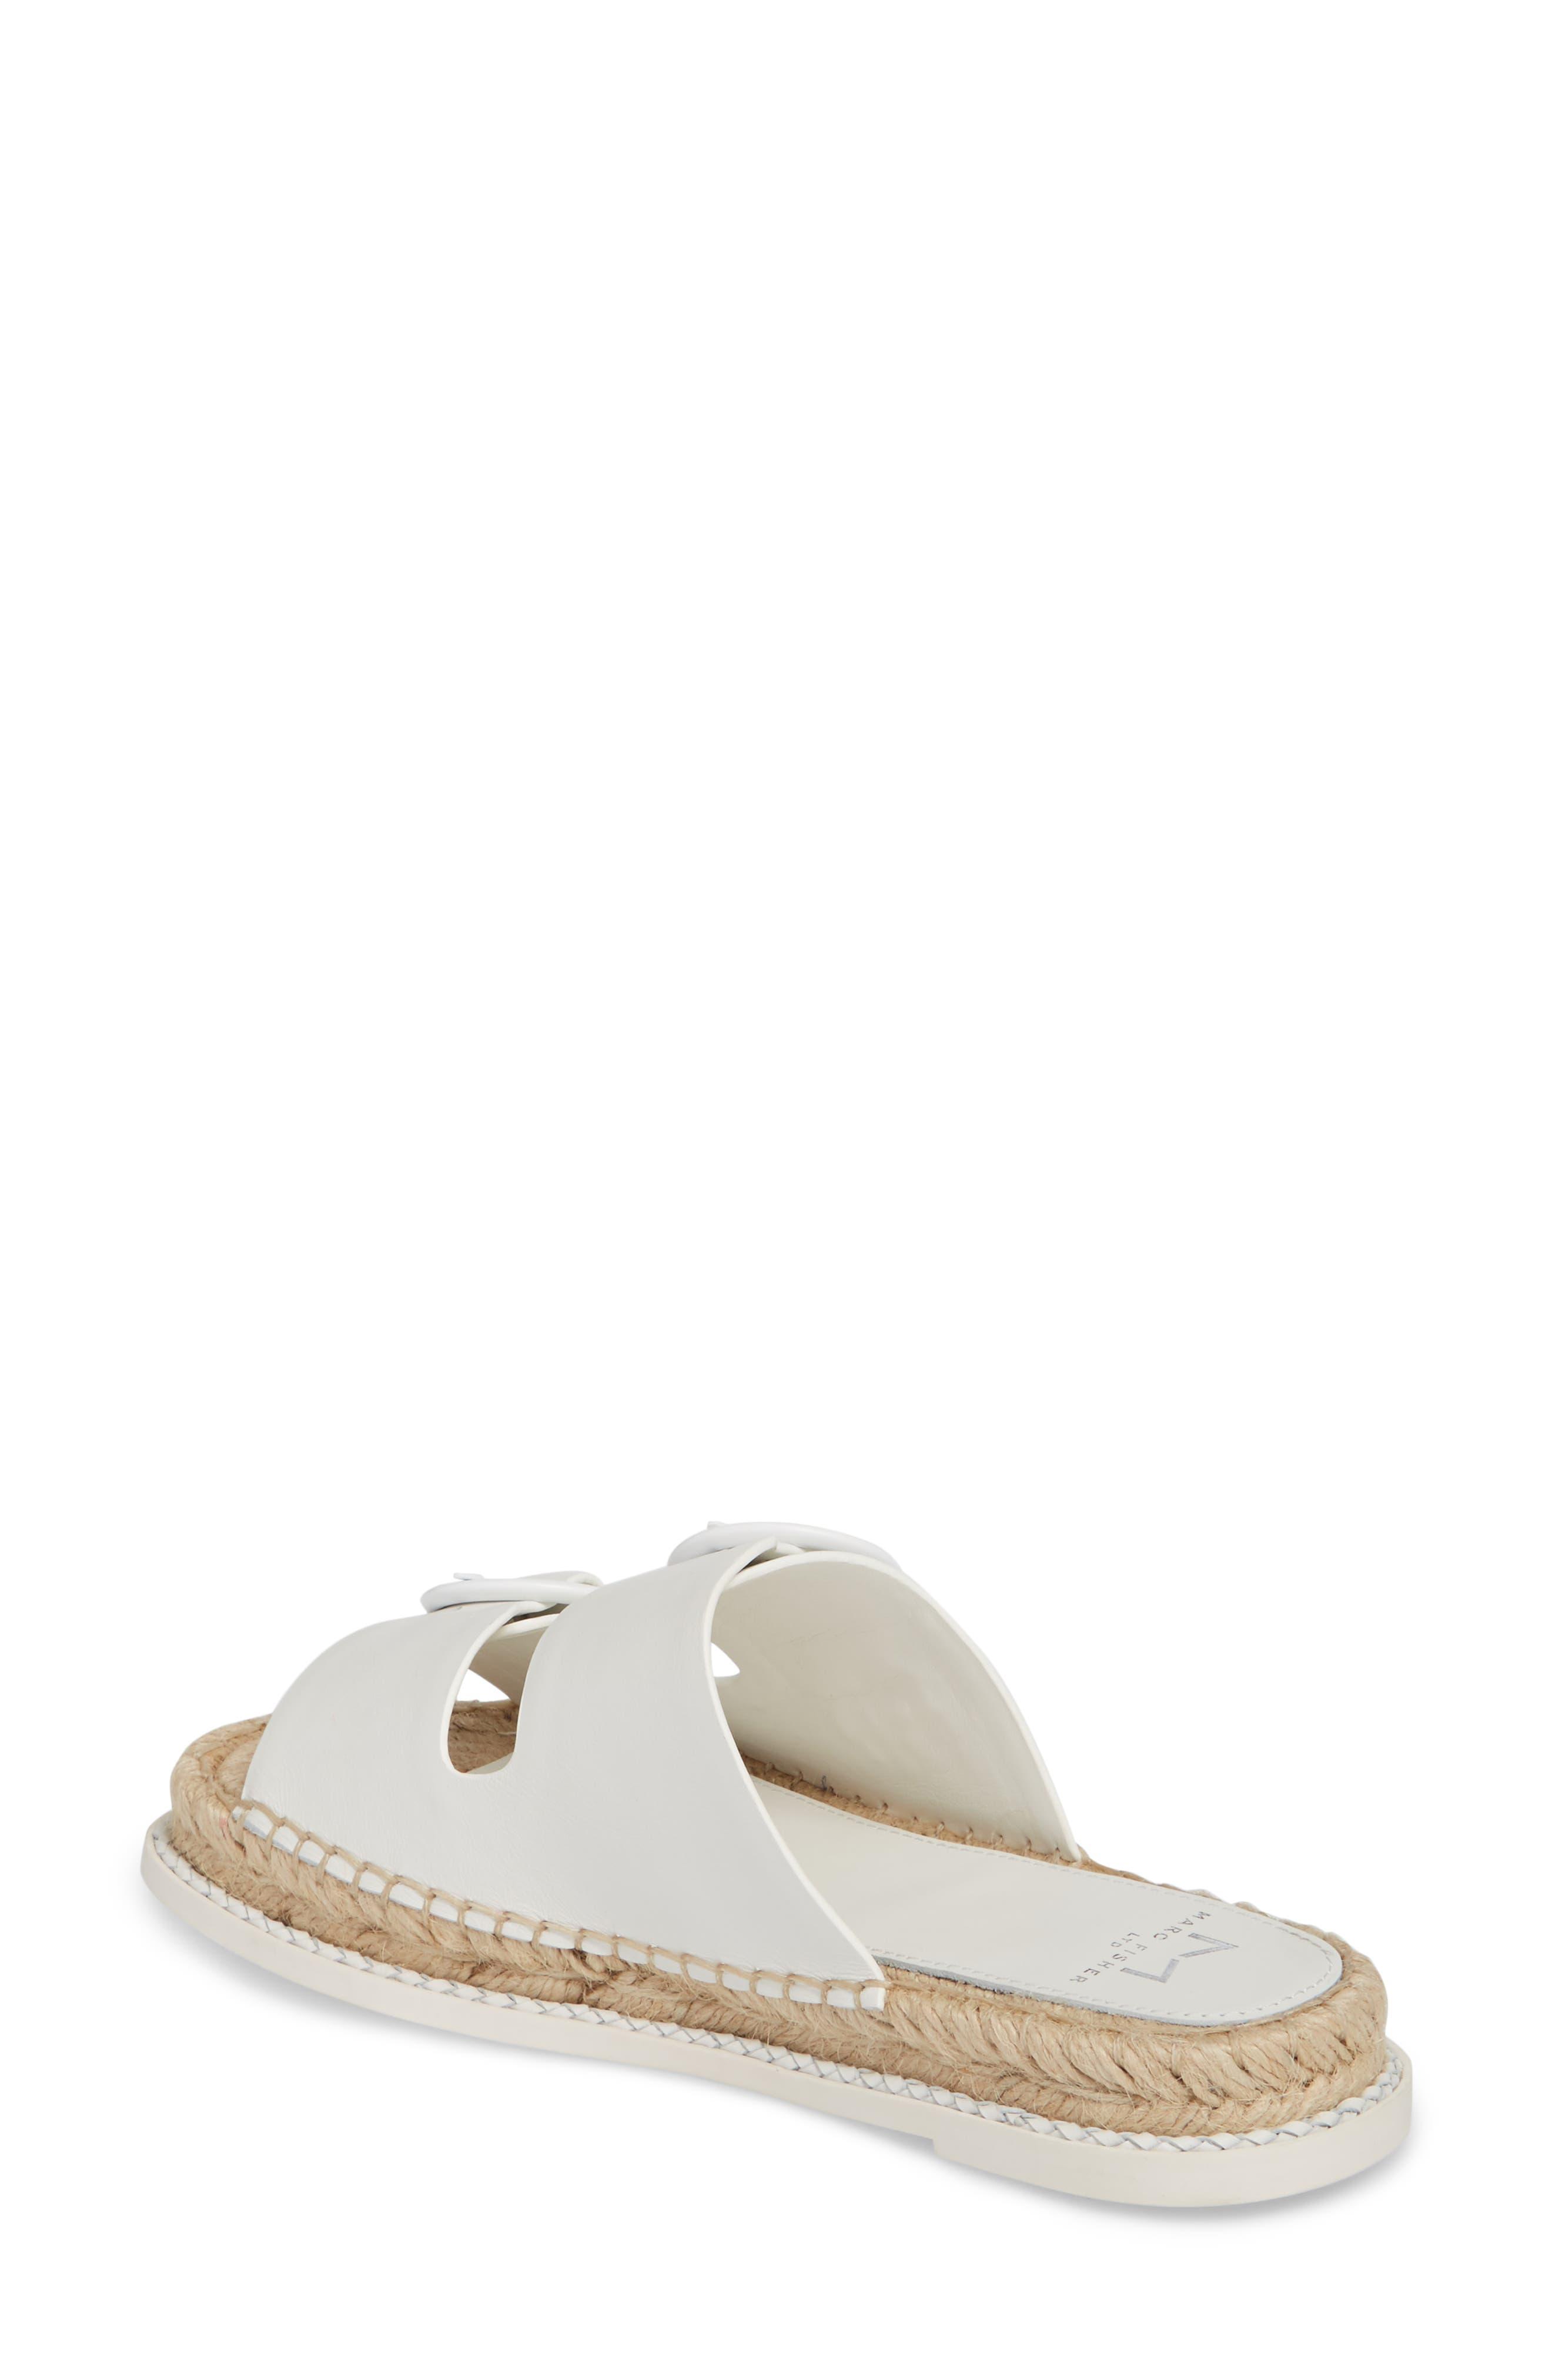 Ramba Espadrille Slide Sandal,                             Alternate thumbnail 2, color,                             White Leather